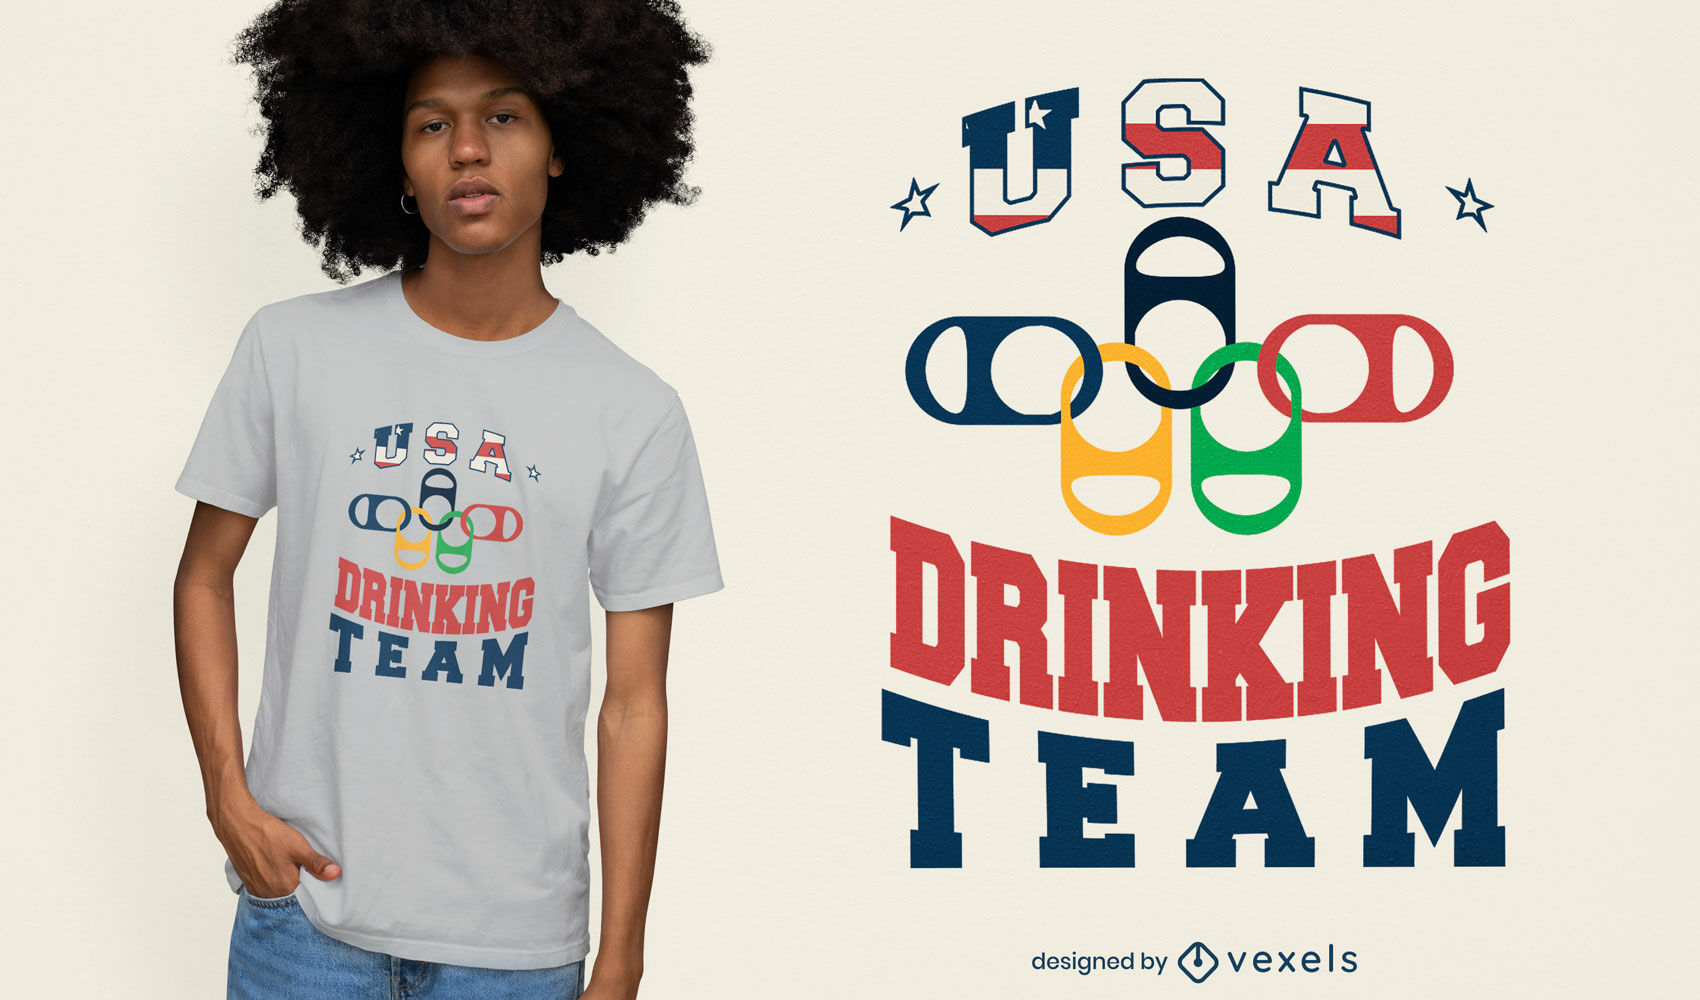 USA drinking team t-shirt design